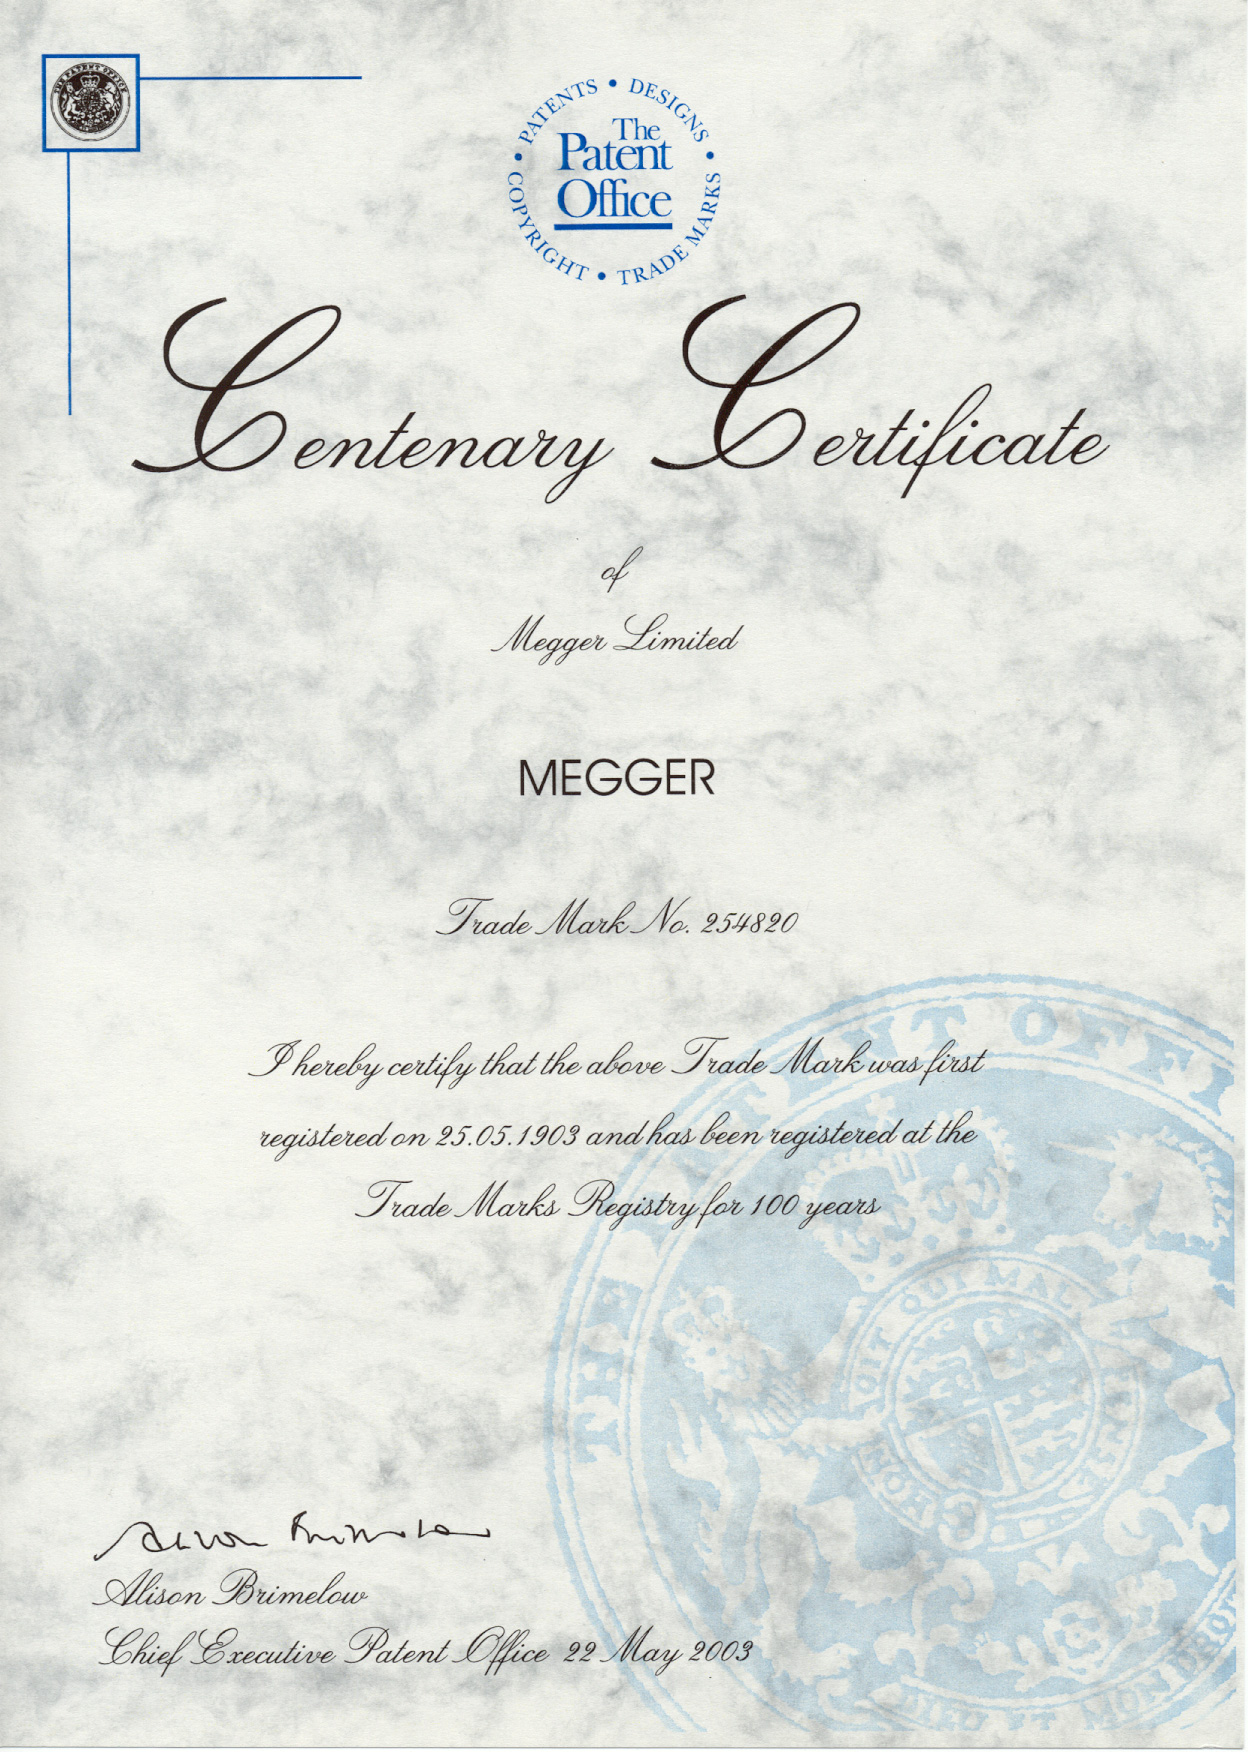 Megger Group Limited : Megger group limited